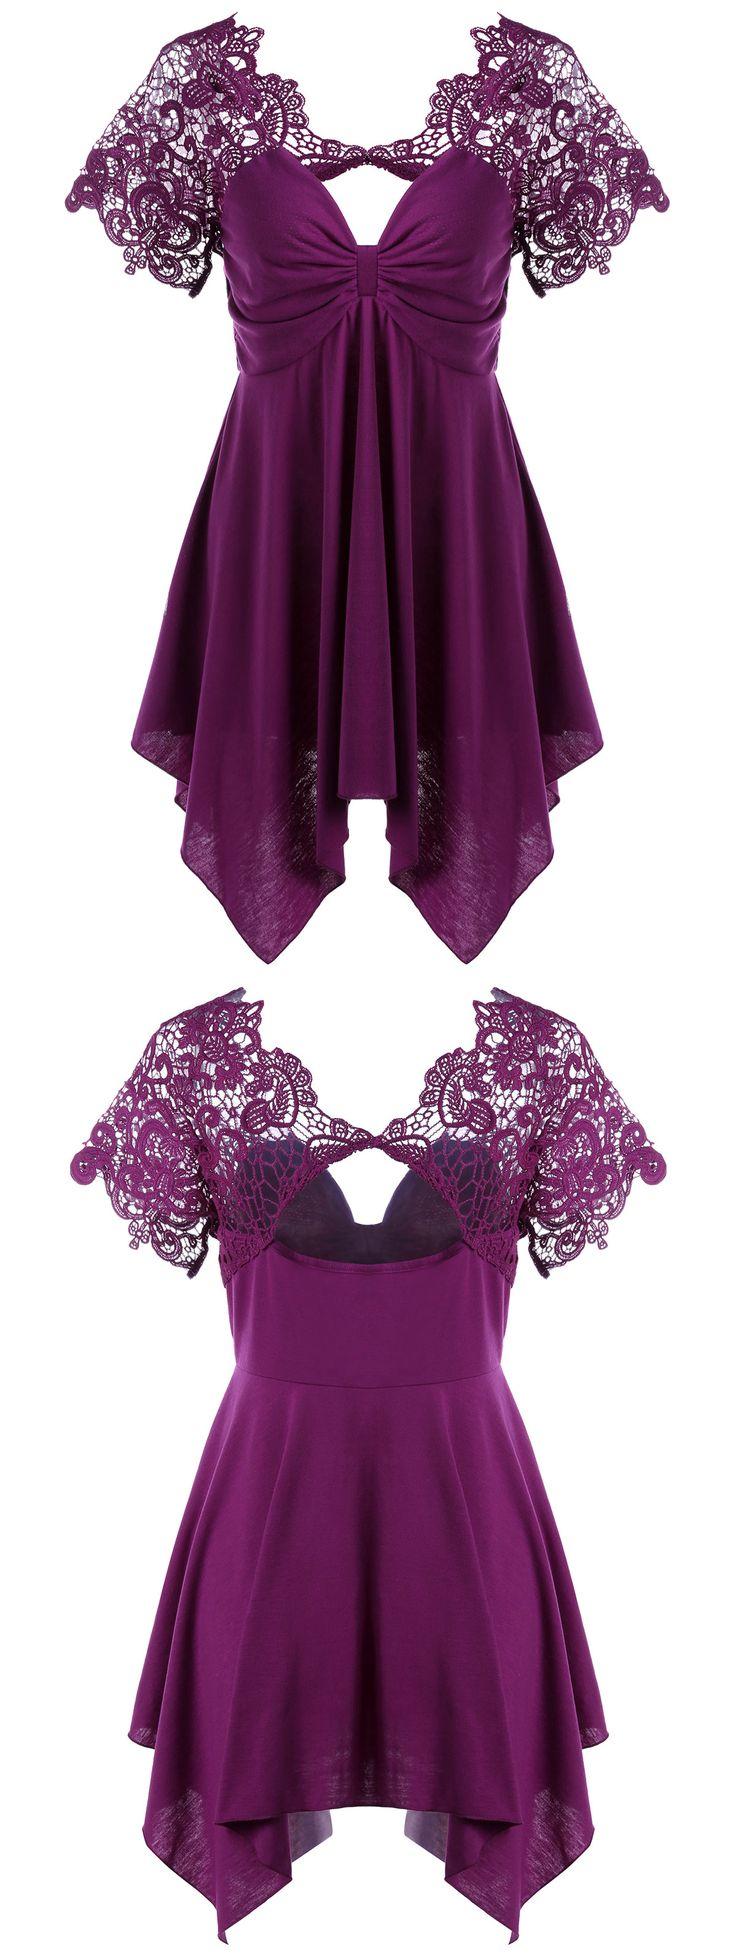 $14.66 Lace Trim Empire Waist Handkerchief T-Shirt